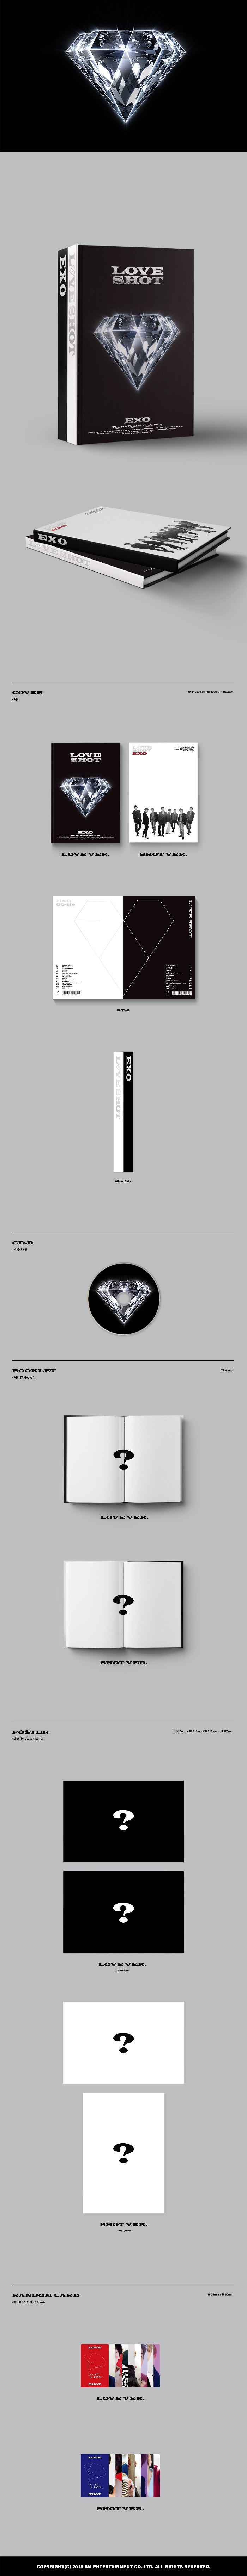 EXO Love Shot album content.png